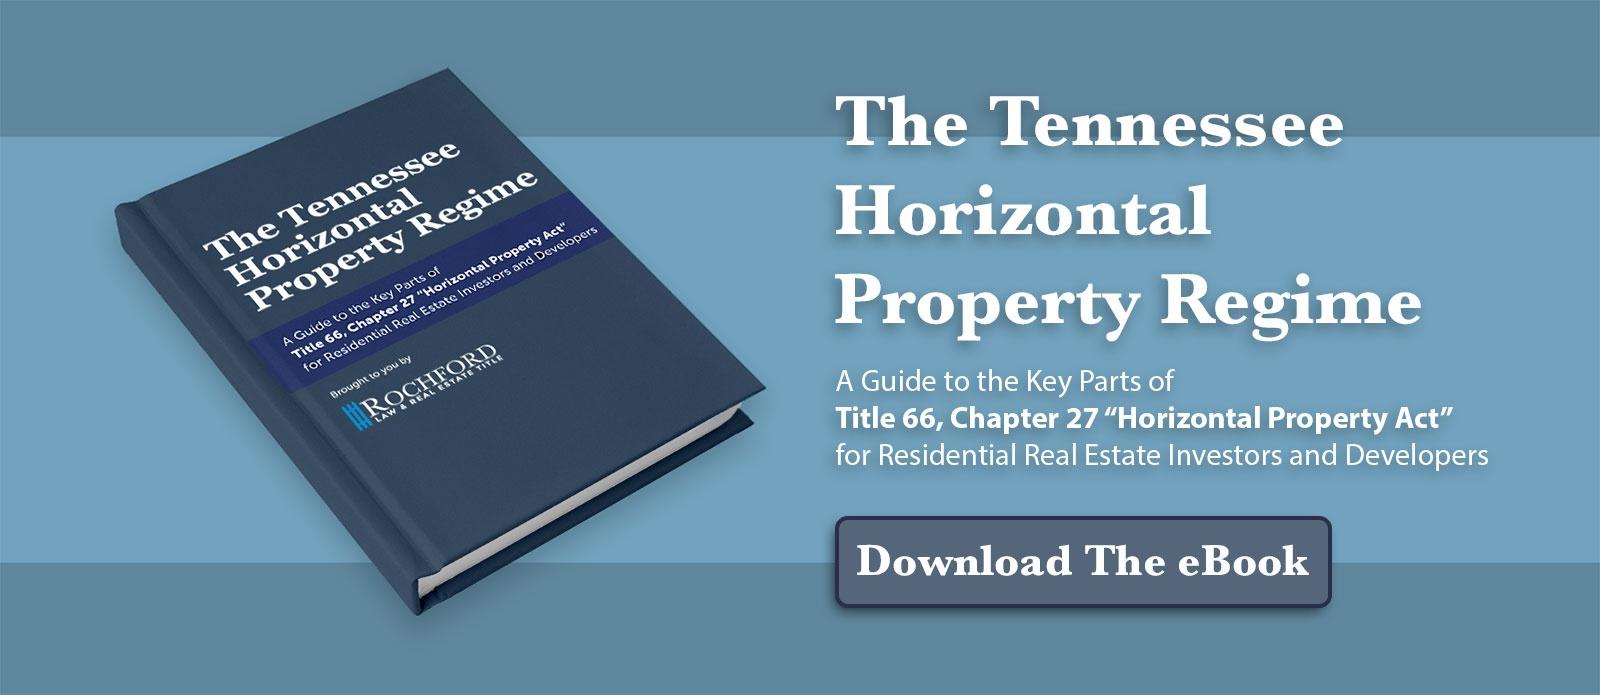 Horizontal Property Regime Ebook